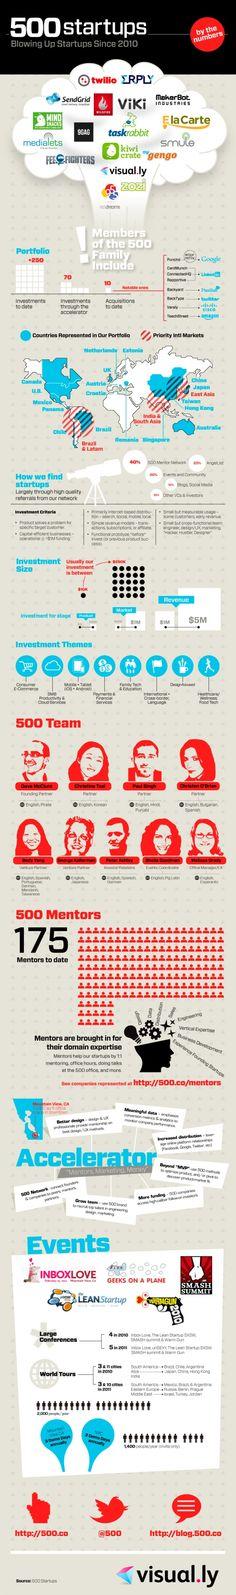 Startup infographic : 500 Startups: Blowing Up Startups Since 2010 via Start Up Business, Starting A Business, Business Ideas, Ideas Emprendedoras, Party Ideas, Innovation, Start Ups, Le Web, Marketing Digital